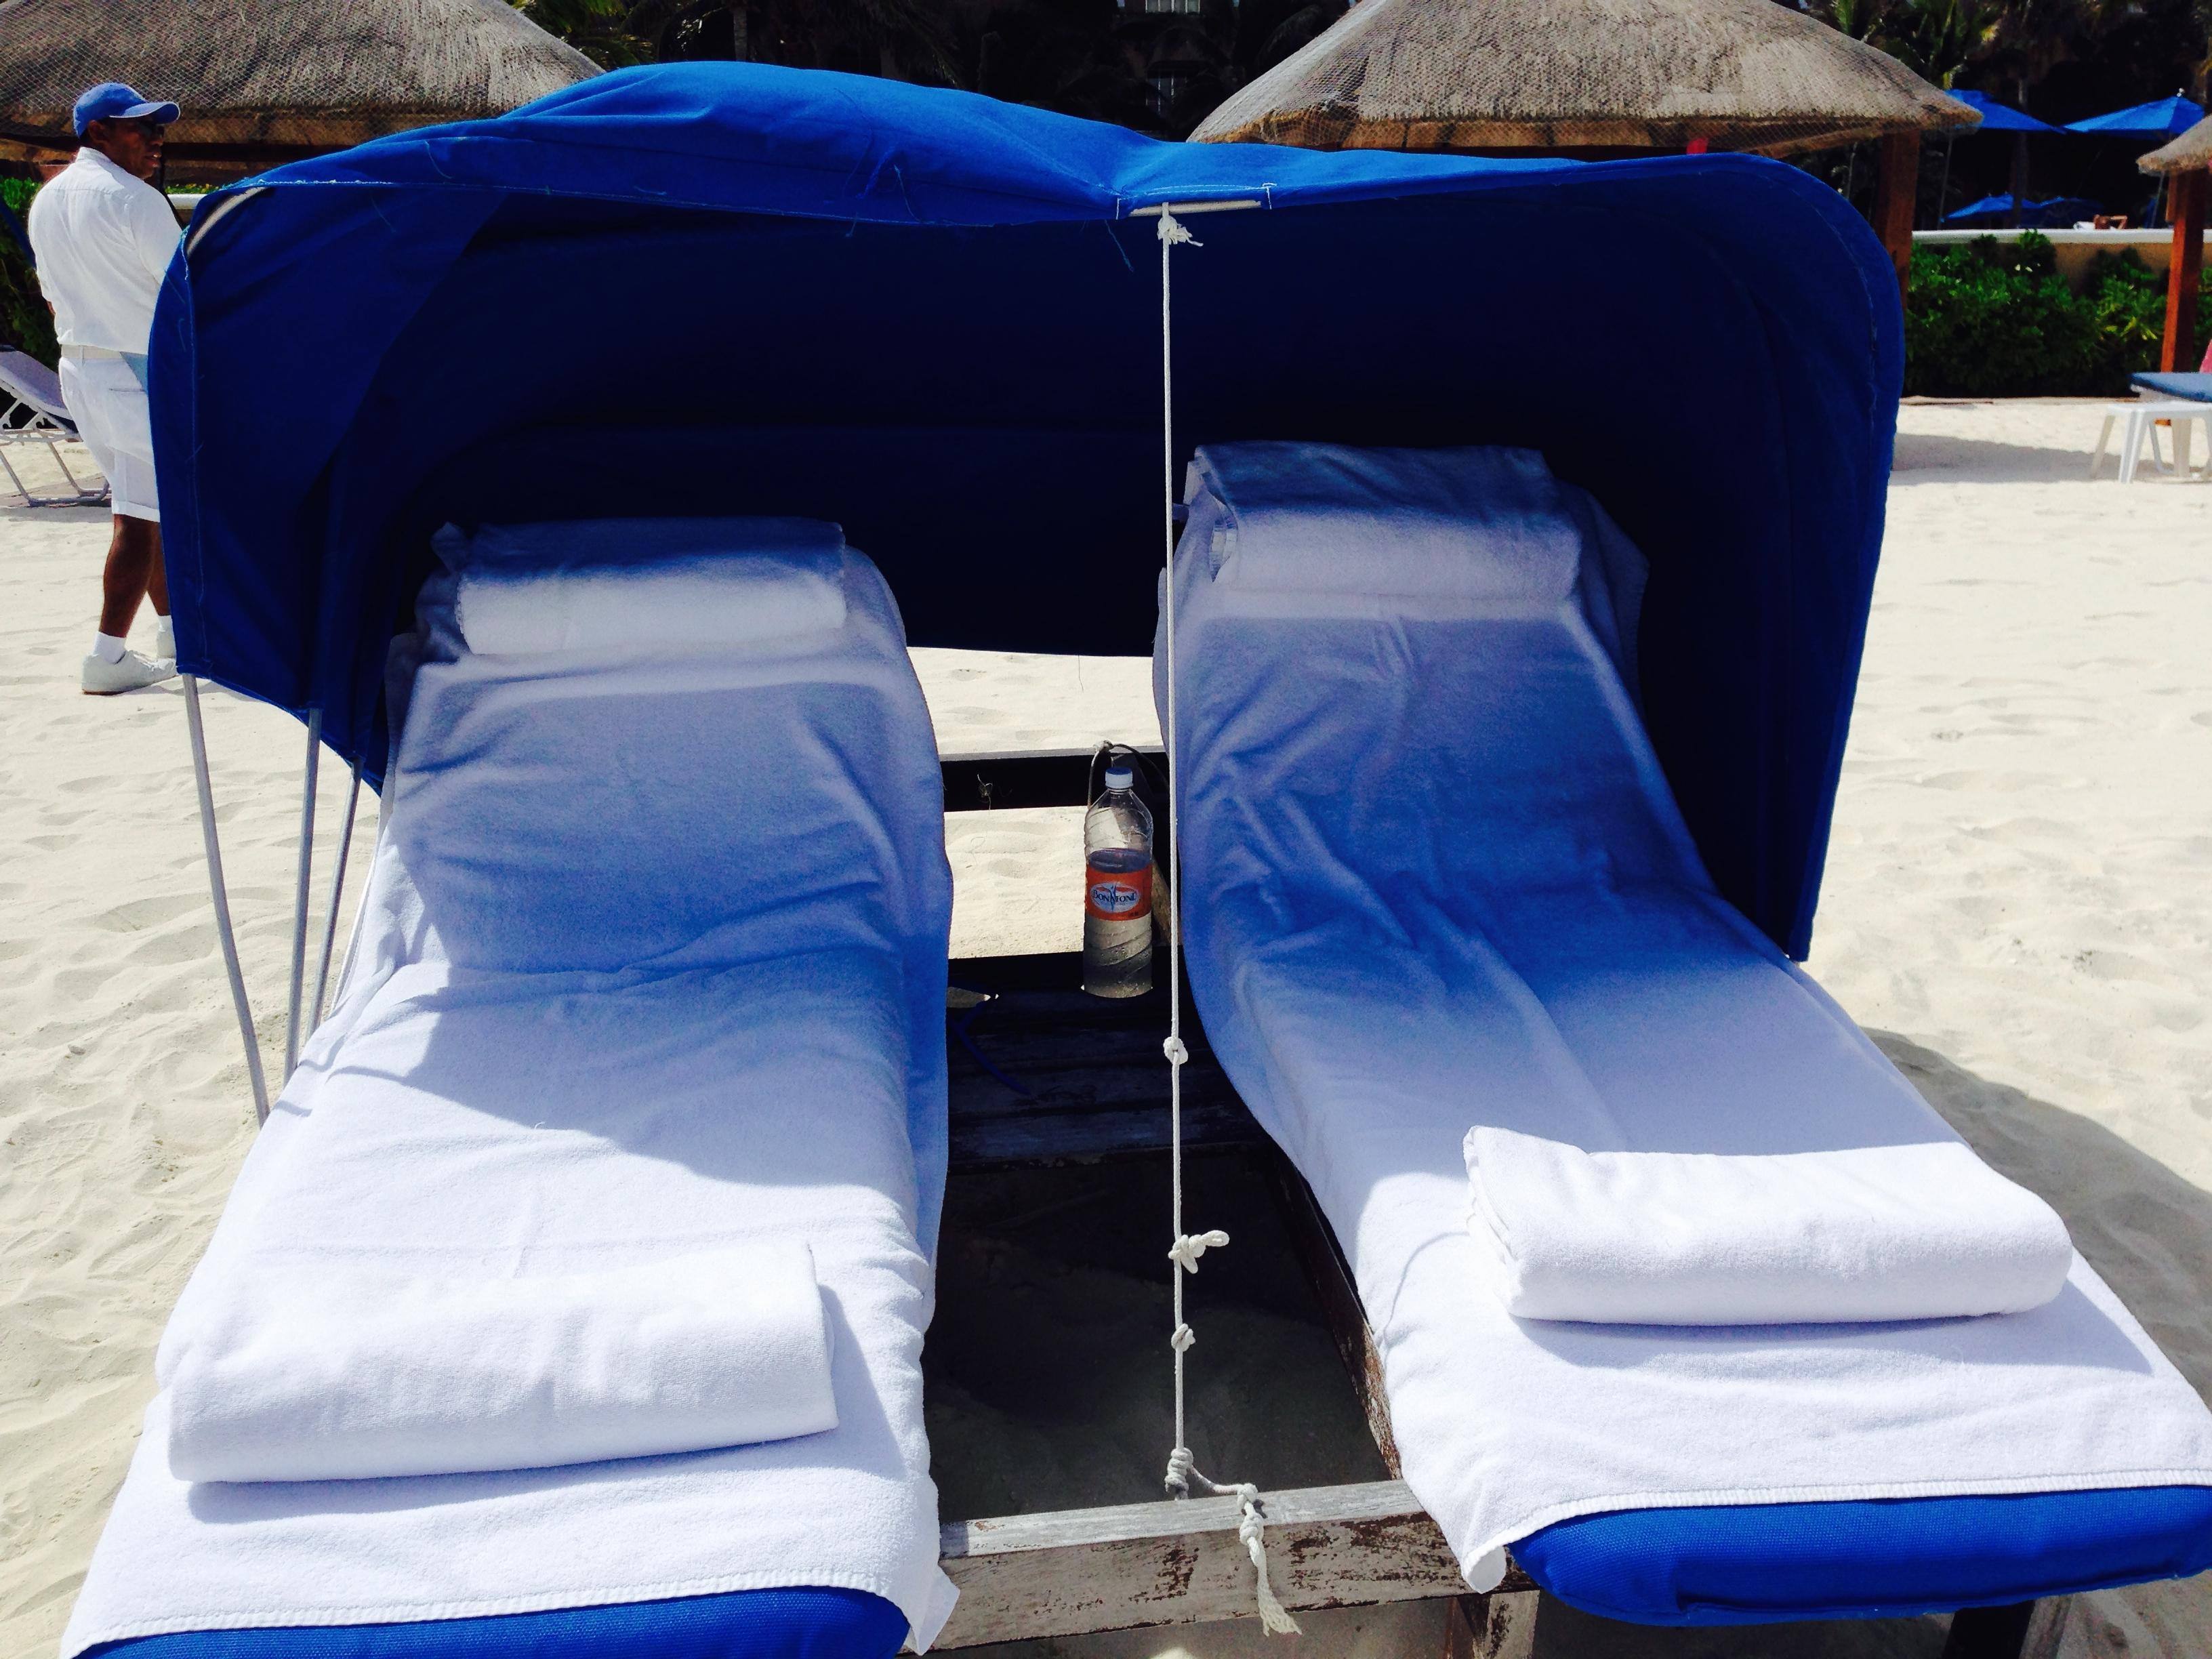 Plenty of covered serviced beach palapas